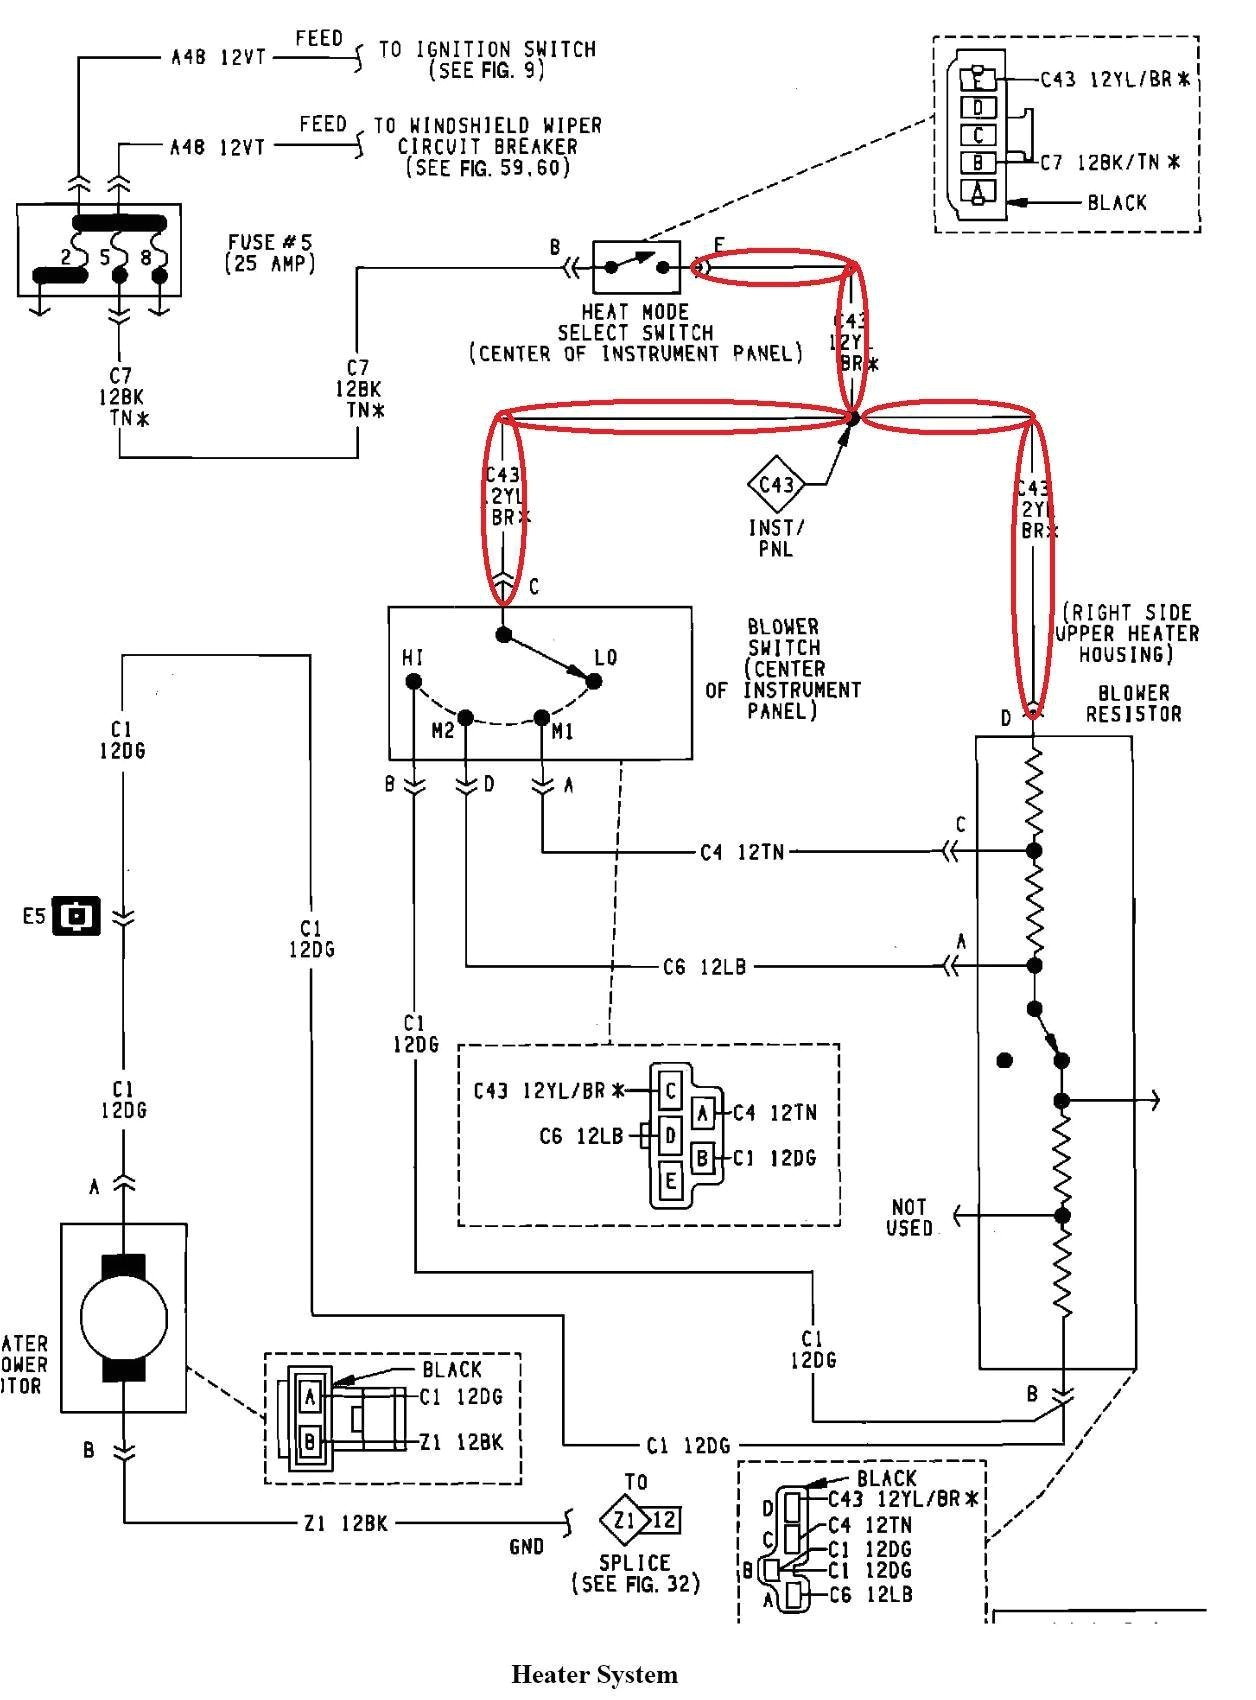 36v ezgo wiring diagram schema diagram database 36 volt ezgo battery wiring diagram 36v ezgo wiring diagram